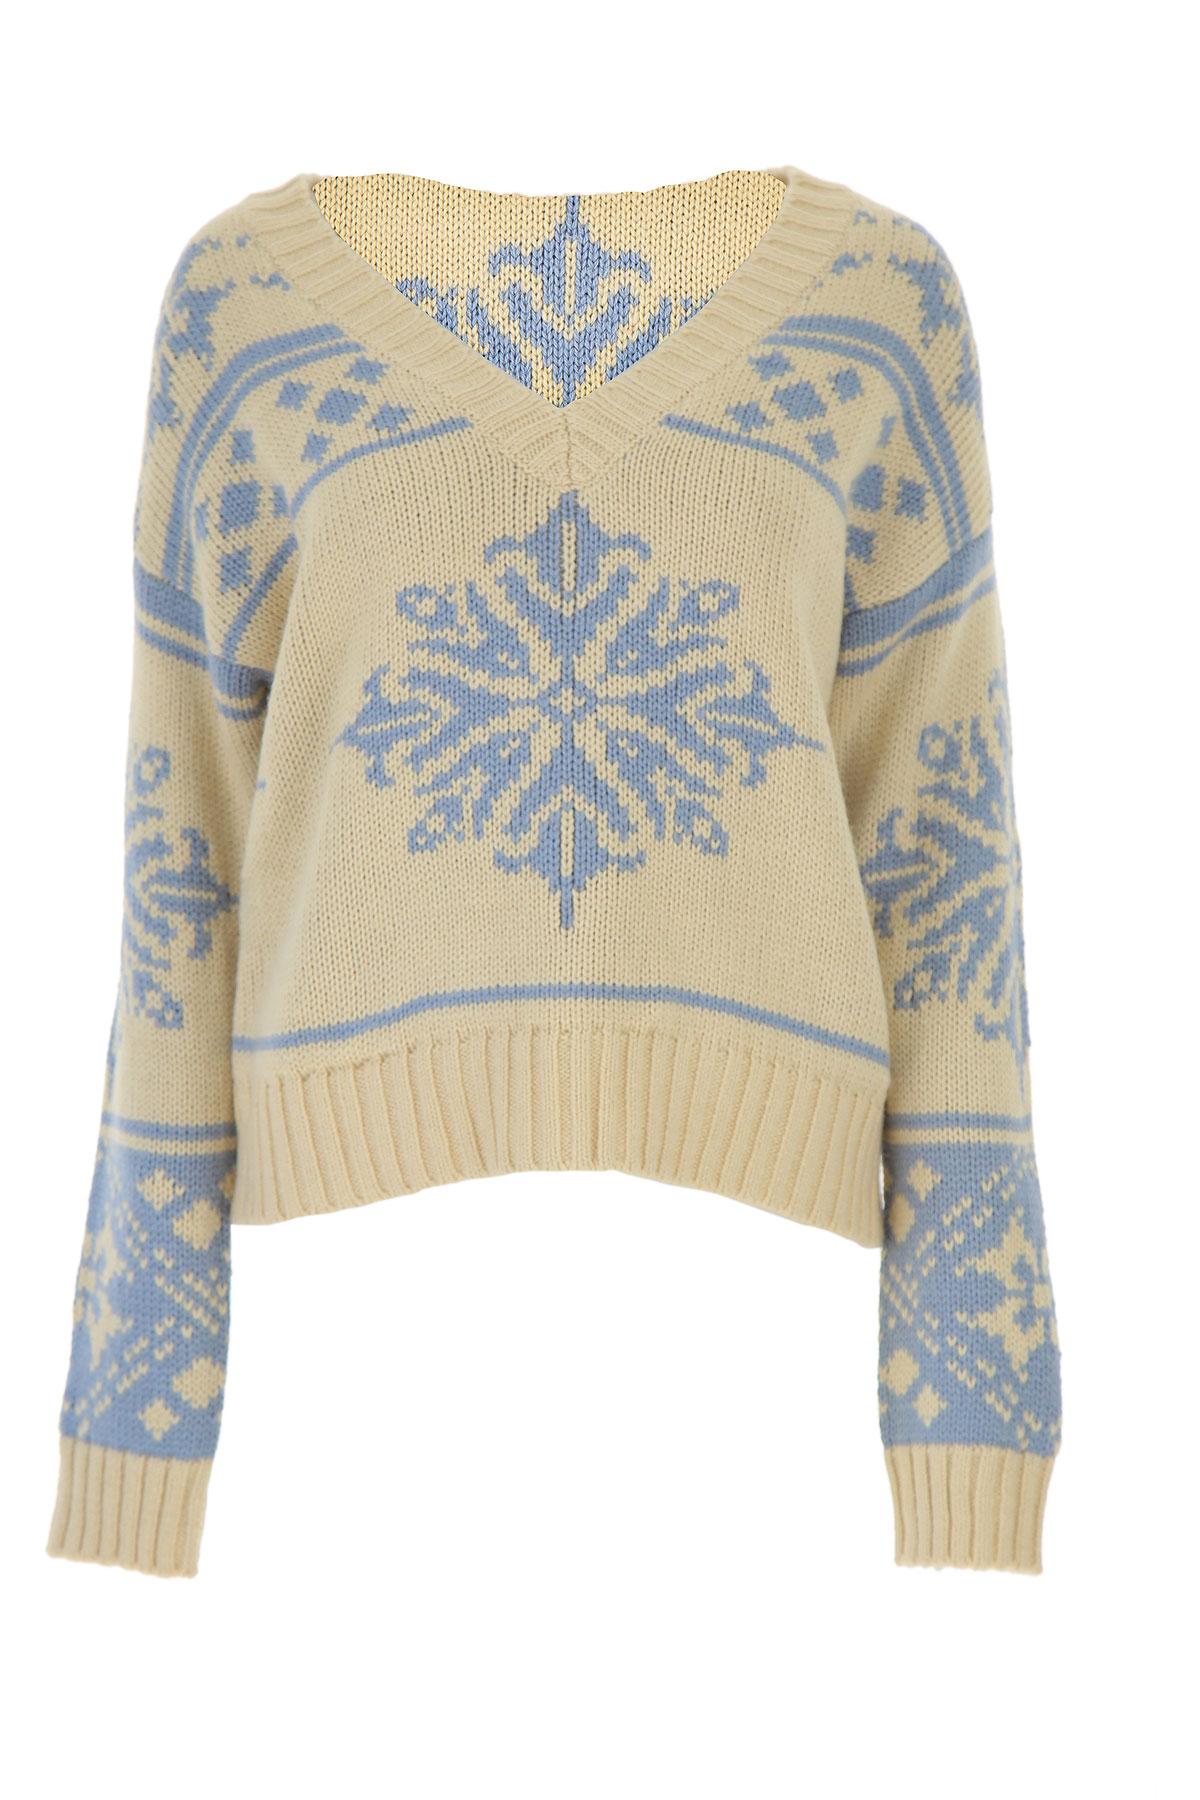 Semicouture Sweater for Women Jumper On Sale, Ecru, Acrylic, 2019, 4 6